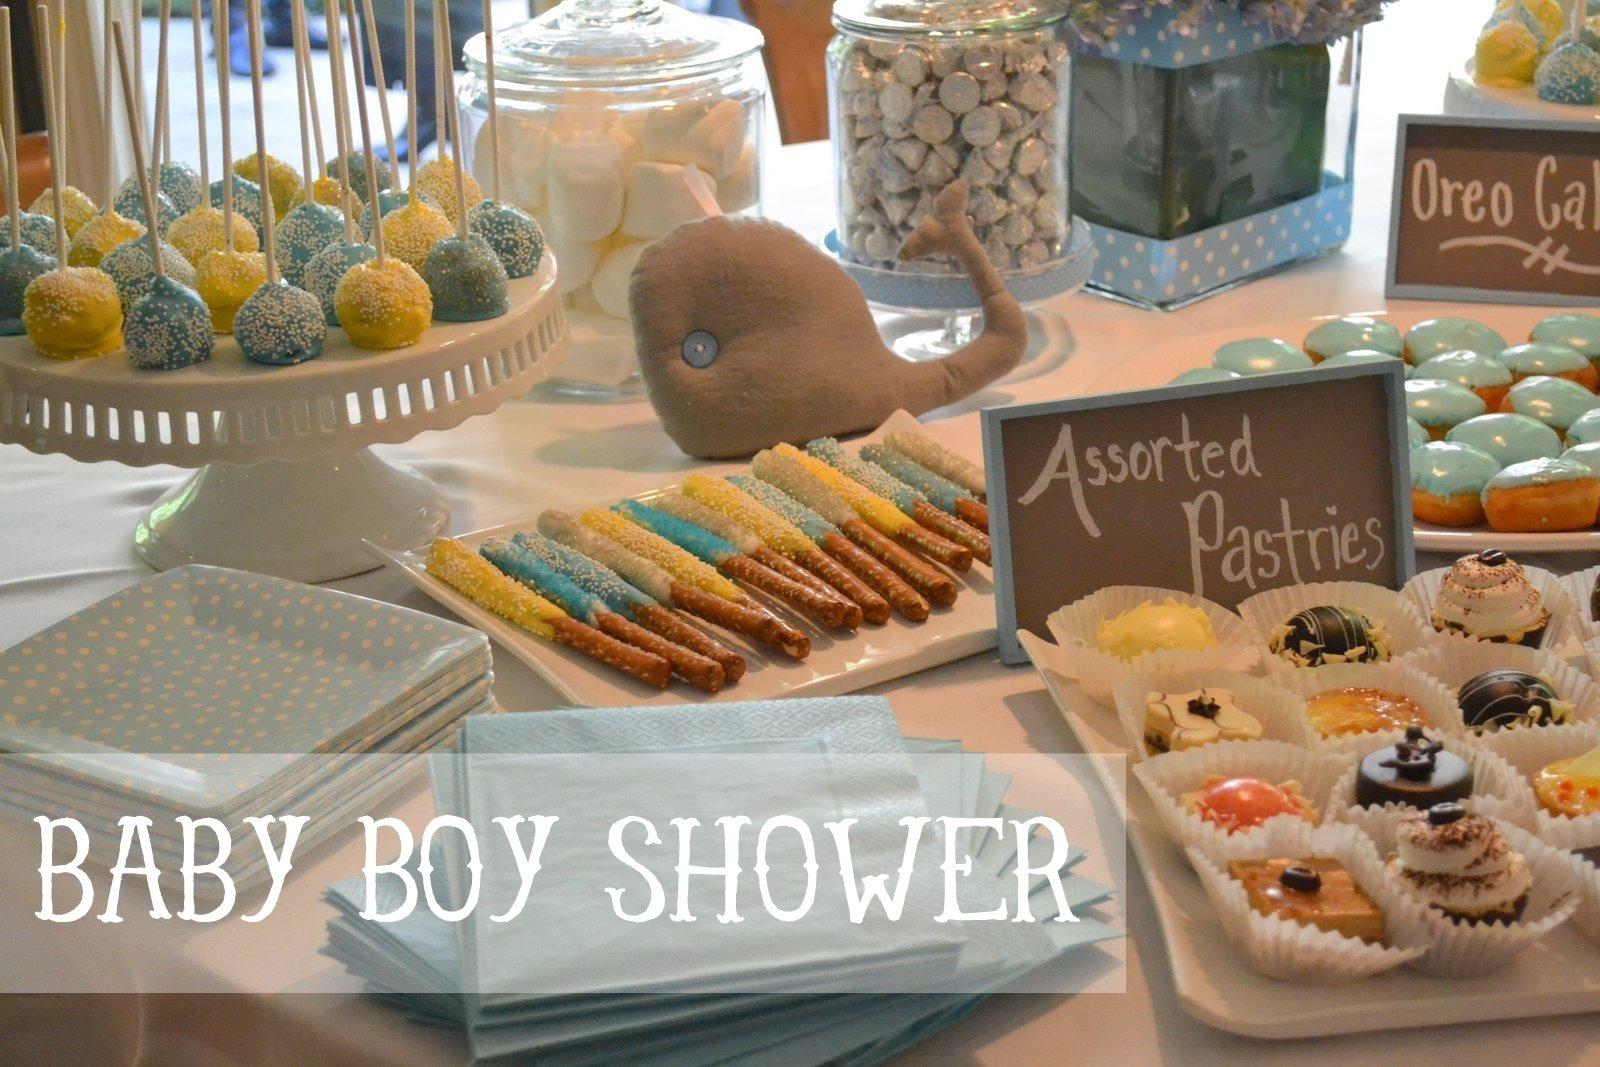 10 Famous Baby Boy Shower Food Ideas whale baby boy shower ideas 1